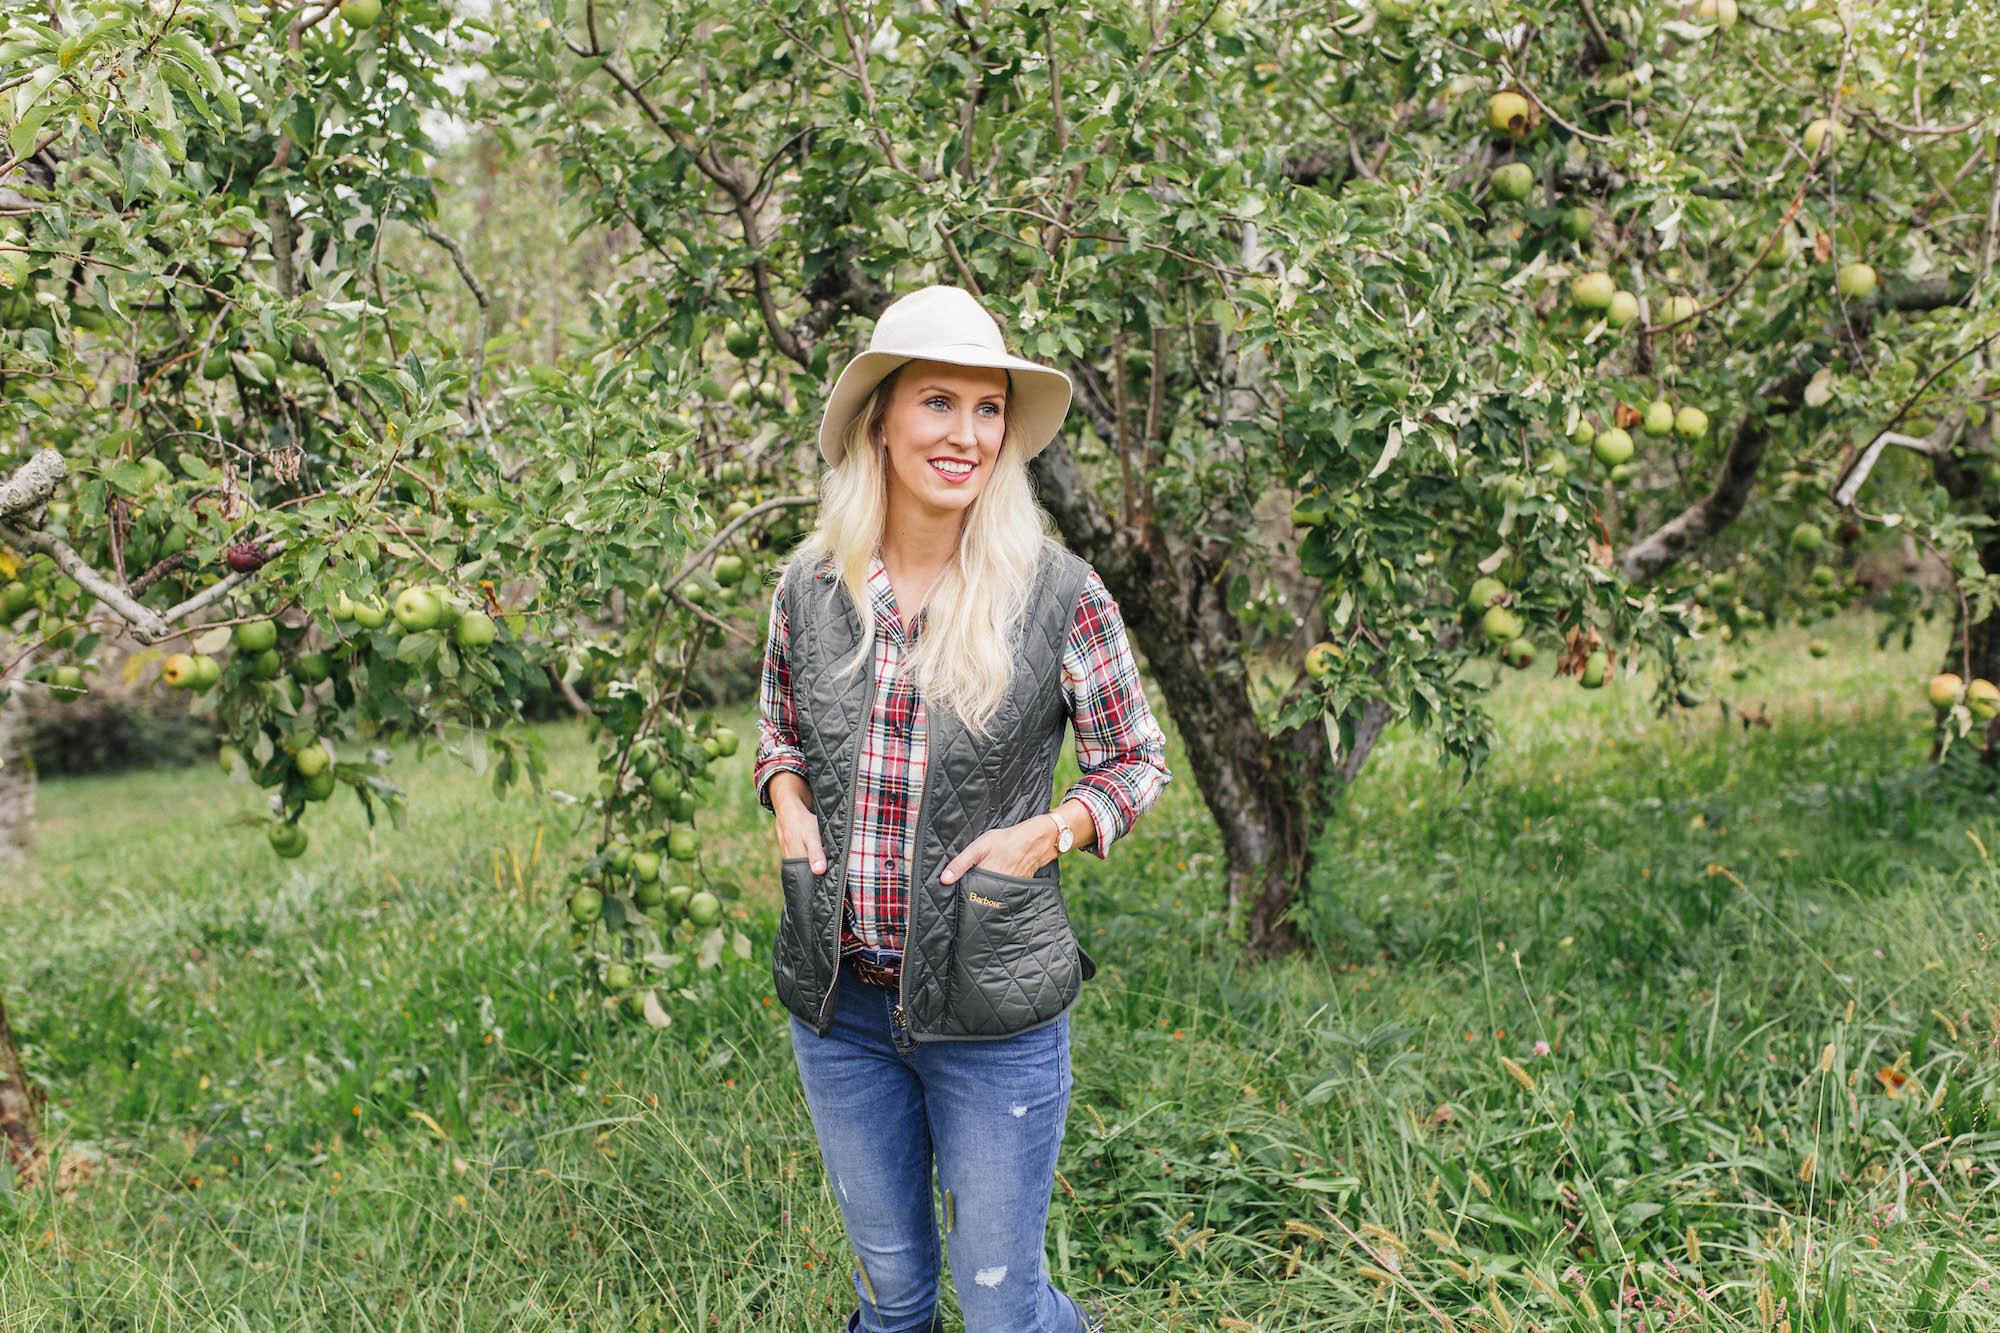 Allison-Cawley-Fall-Essentials-Peachfully-Chic-10